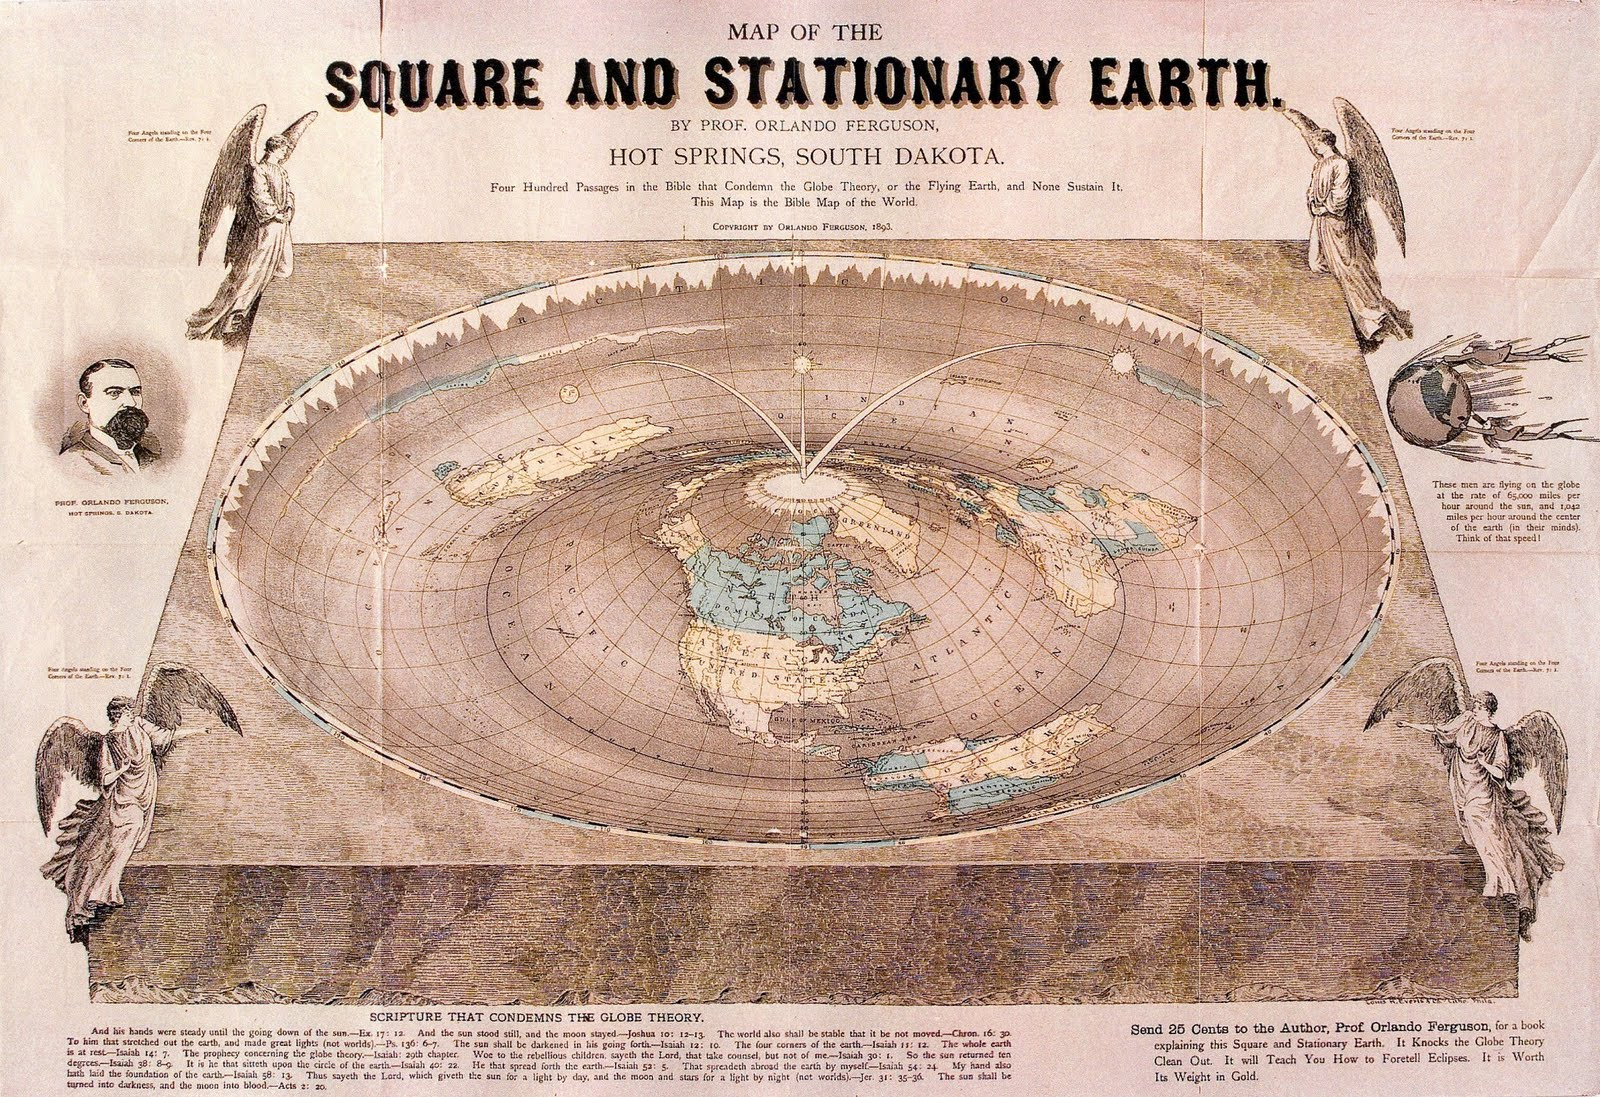 orlando ferguson, flat earth map